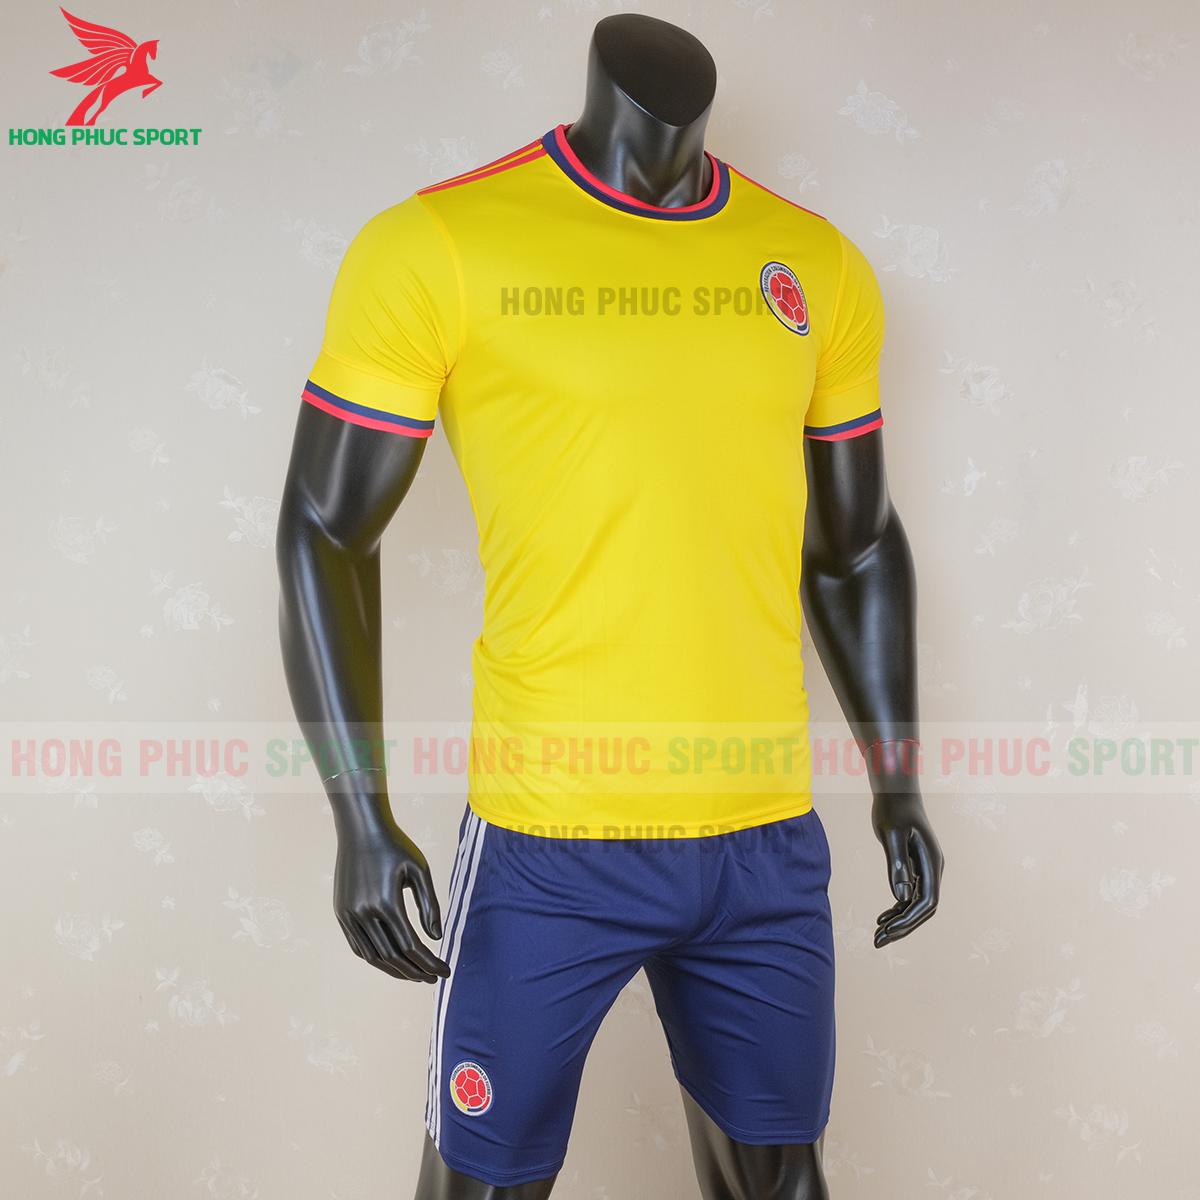 https://cdn.hongphucsport.com/unsafe/s4.shopbay.vn/files/285/ao-bong-da-tuyen-colombia-2020-san-khach-1-5f7163bfe8602.png